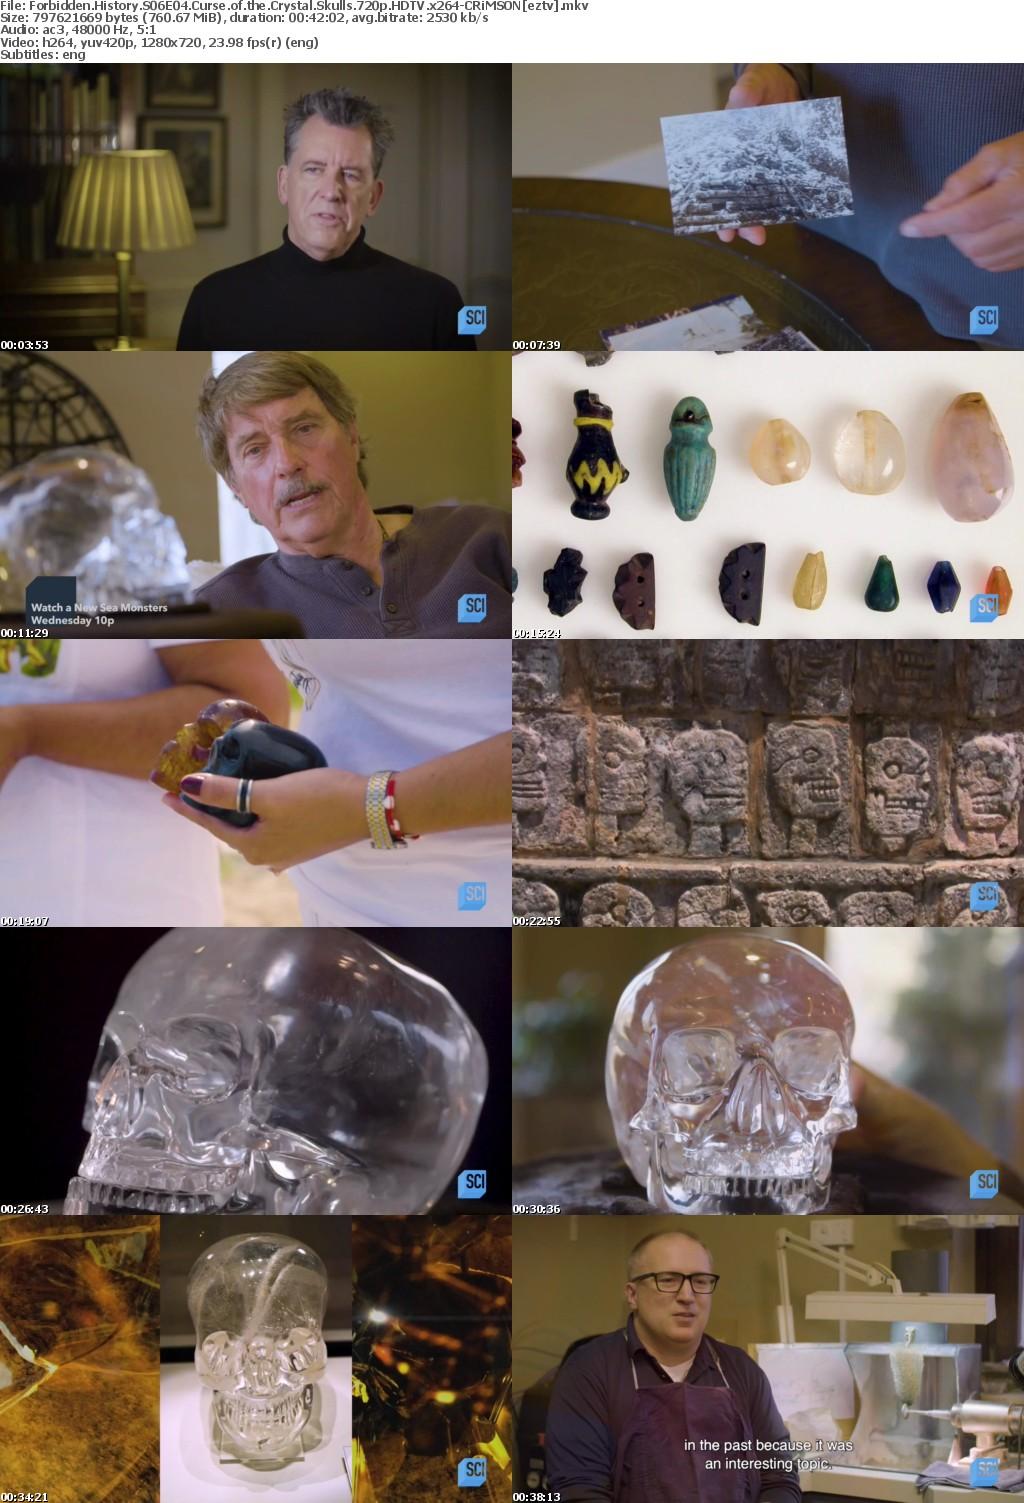 Forbidden History S06E04 Curse of the Crystal Skulls 720p HDTV x264-CRiMSON